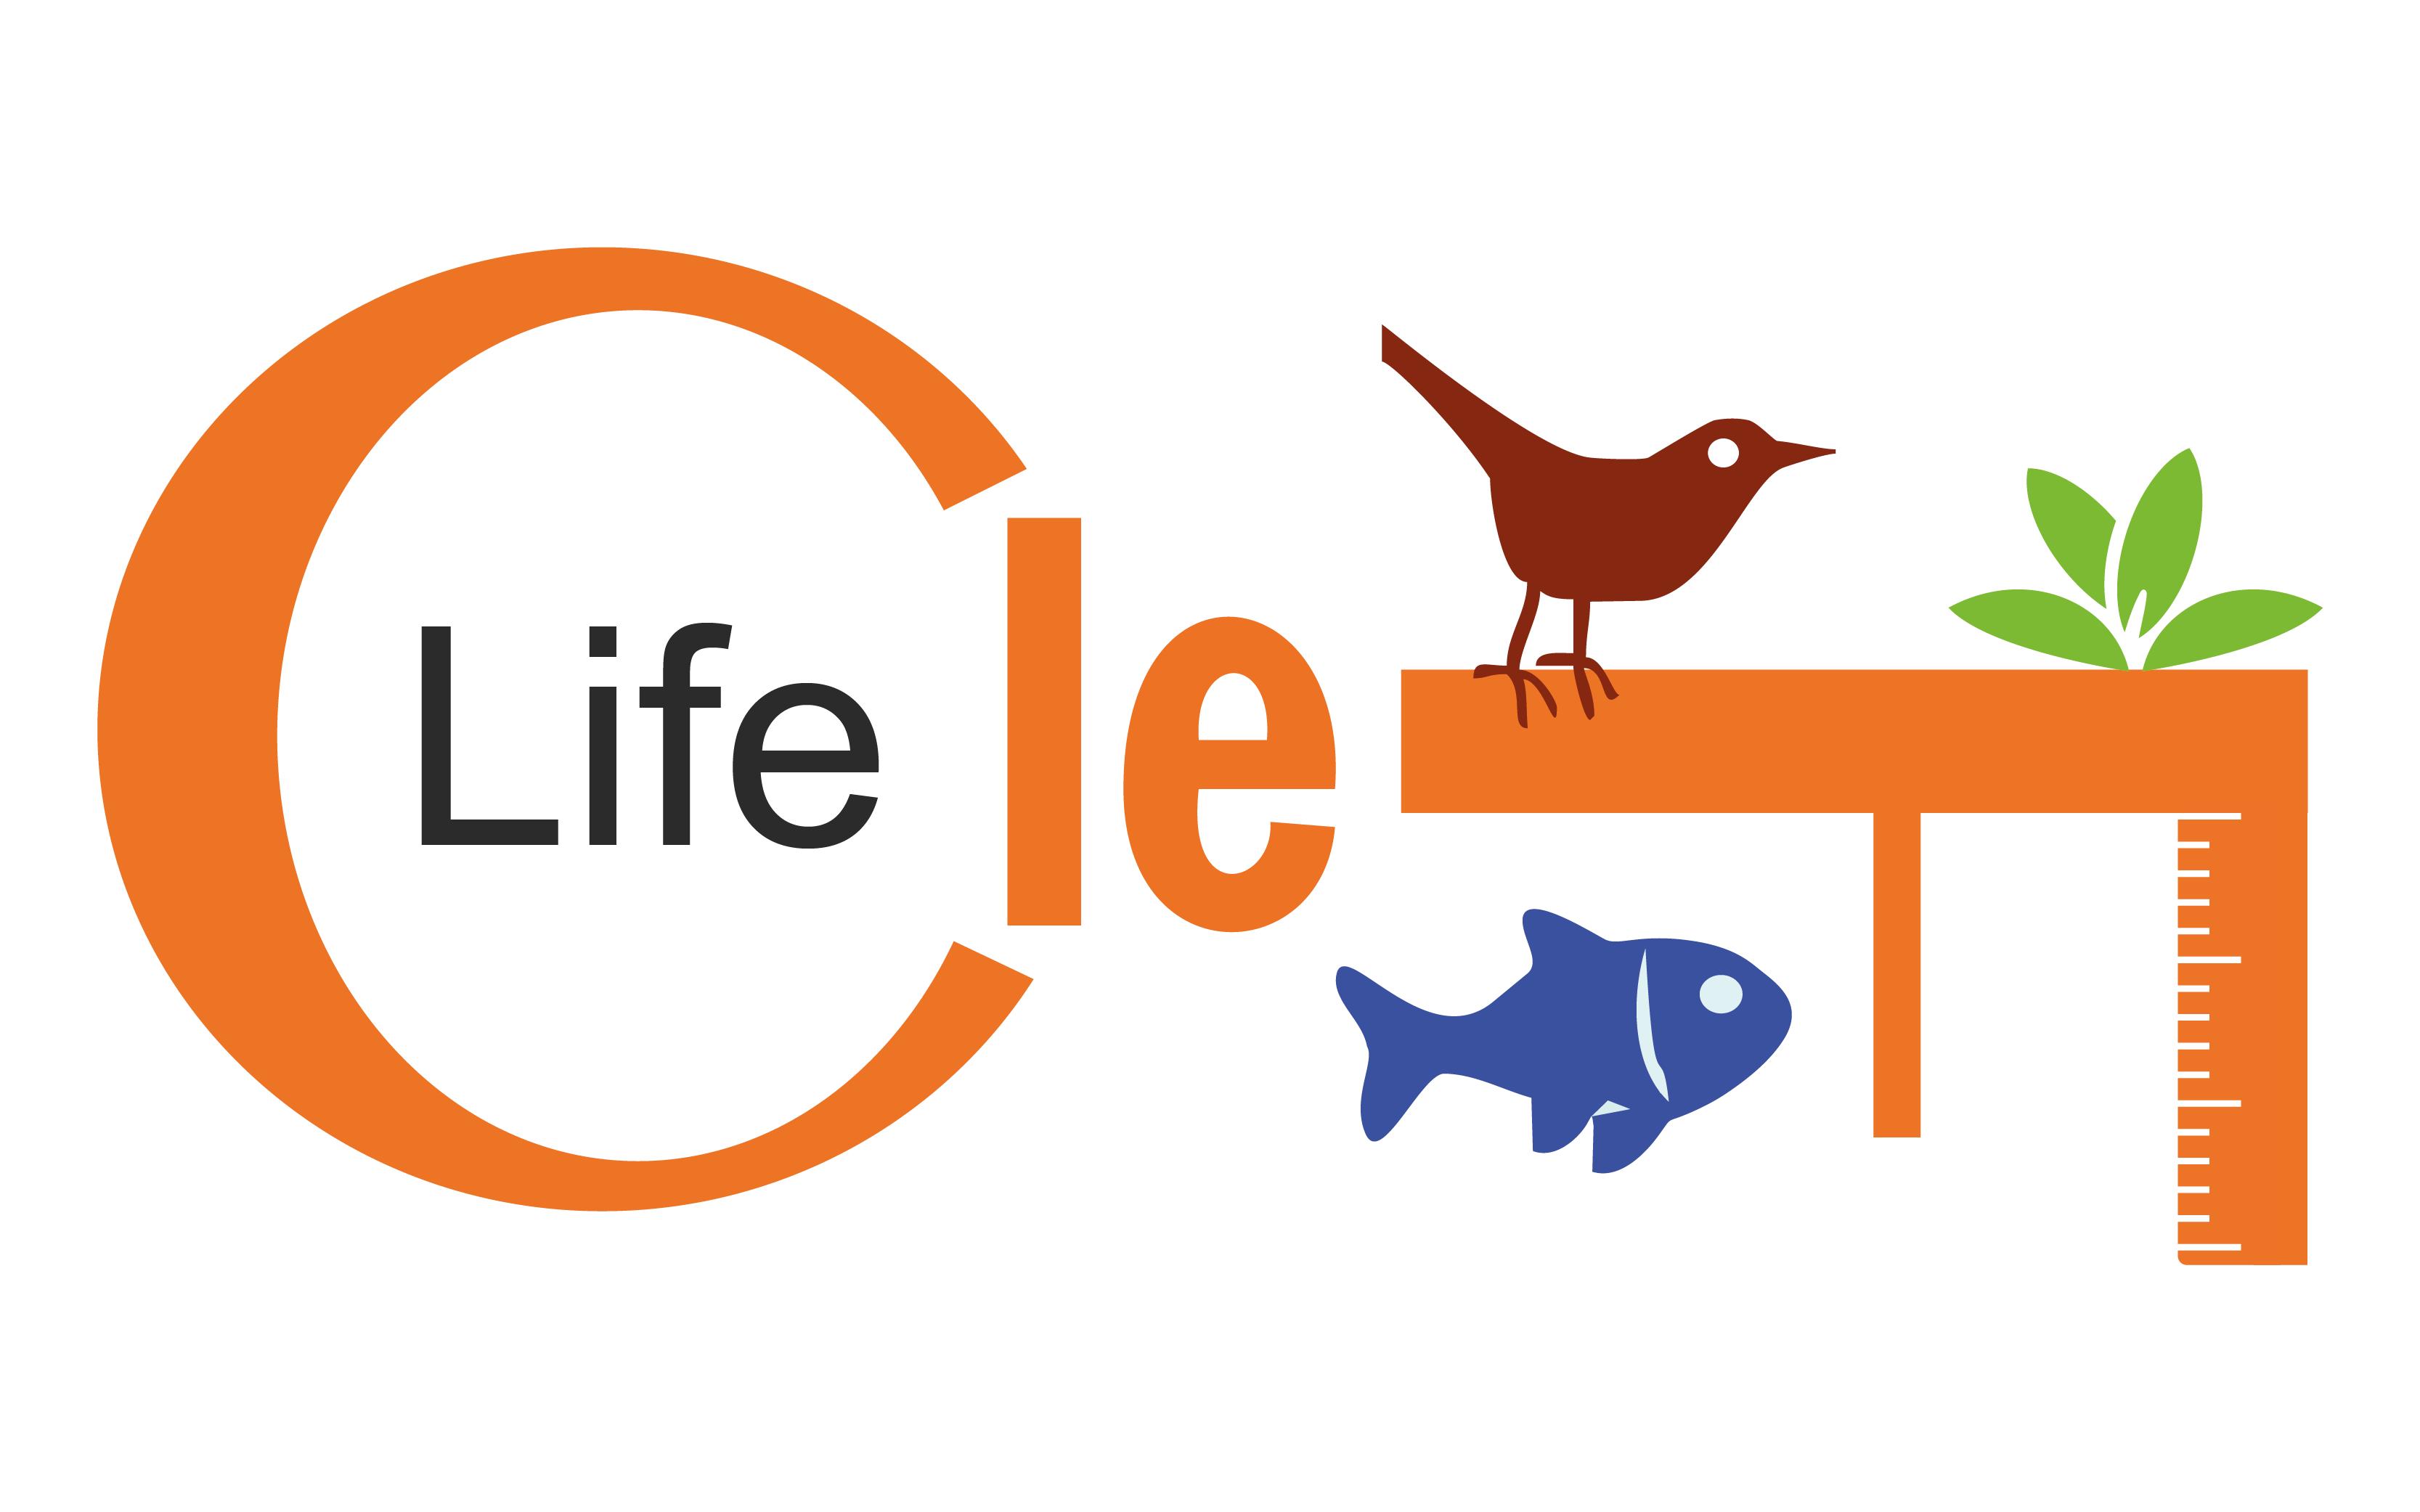 logolifeclef